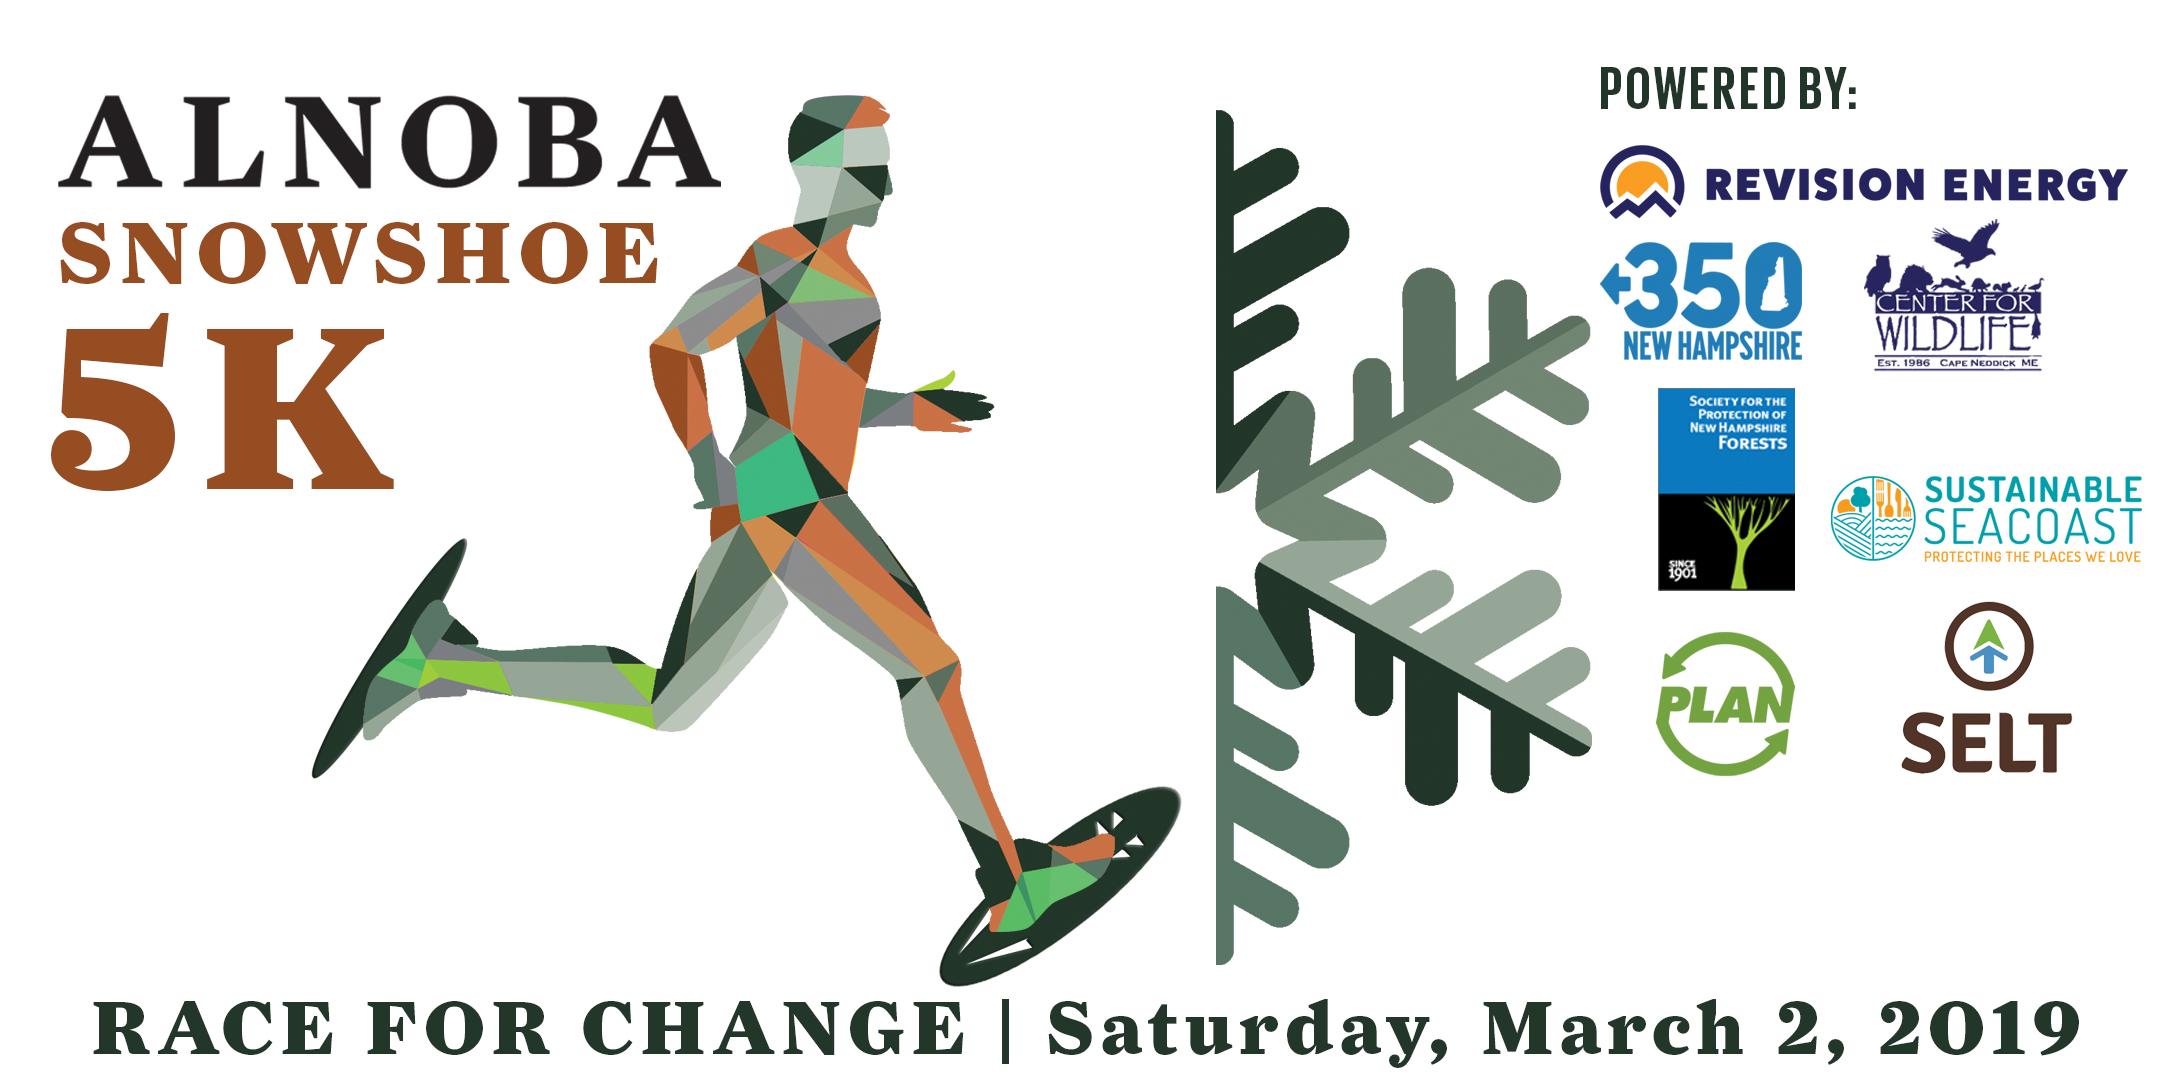 'Race for Change' Snowshoe 5K